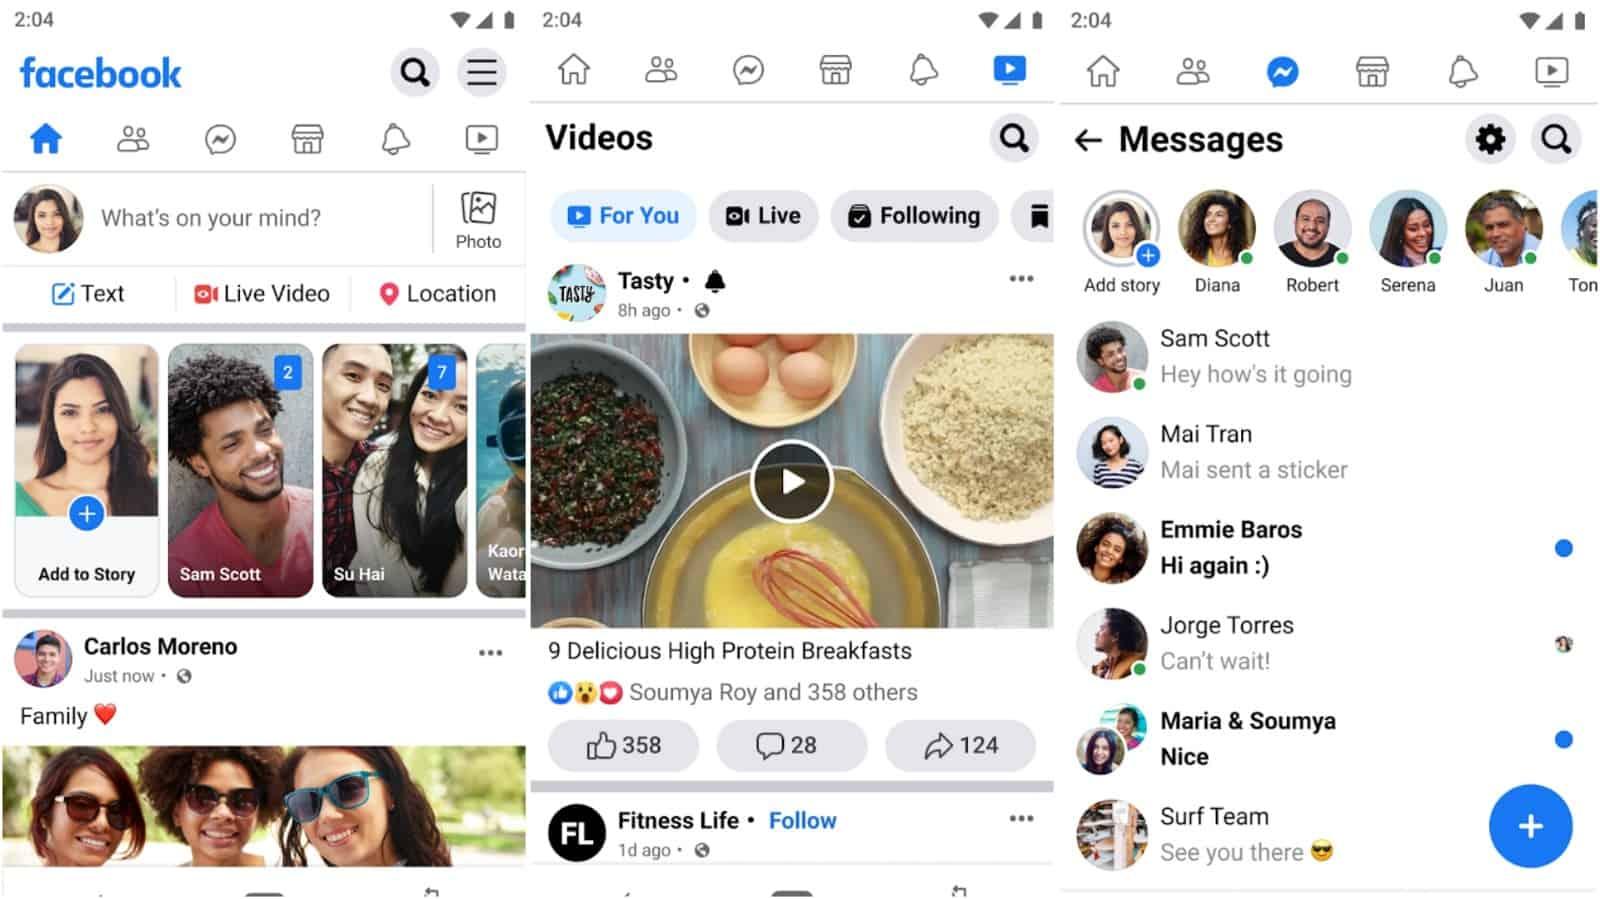 Facebook Lite app grid image